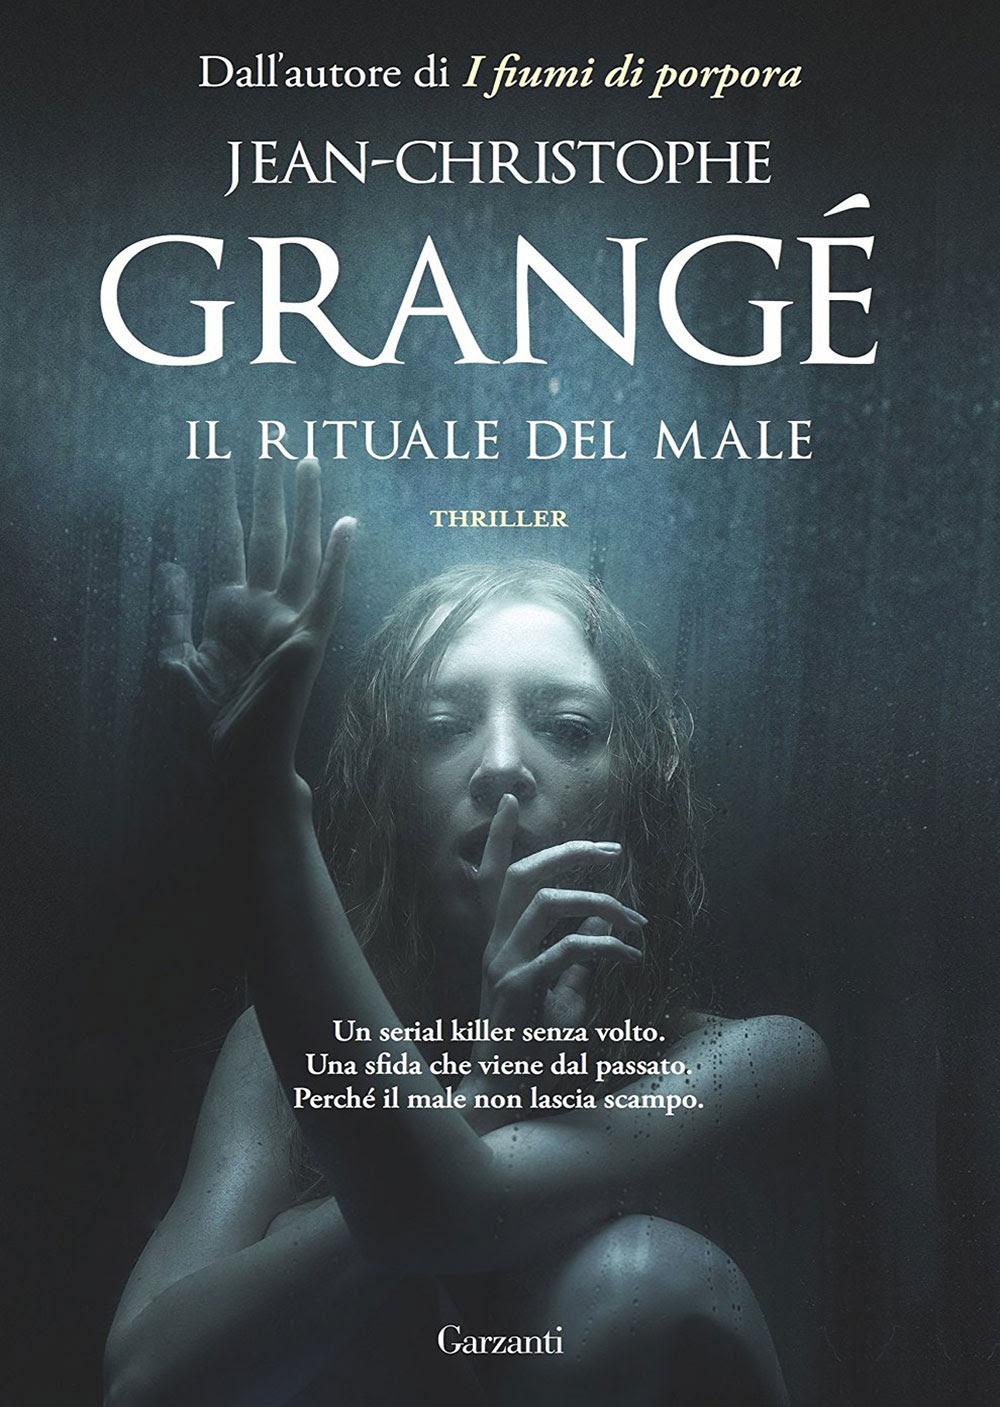 Grangé